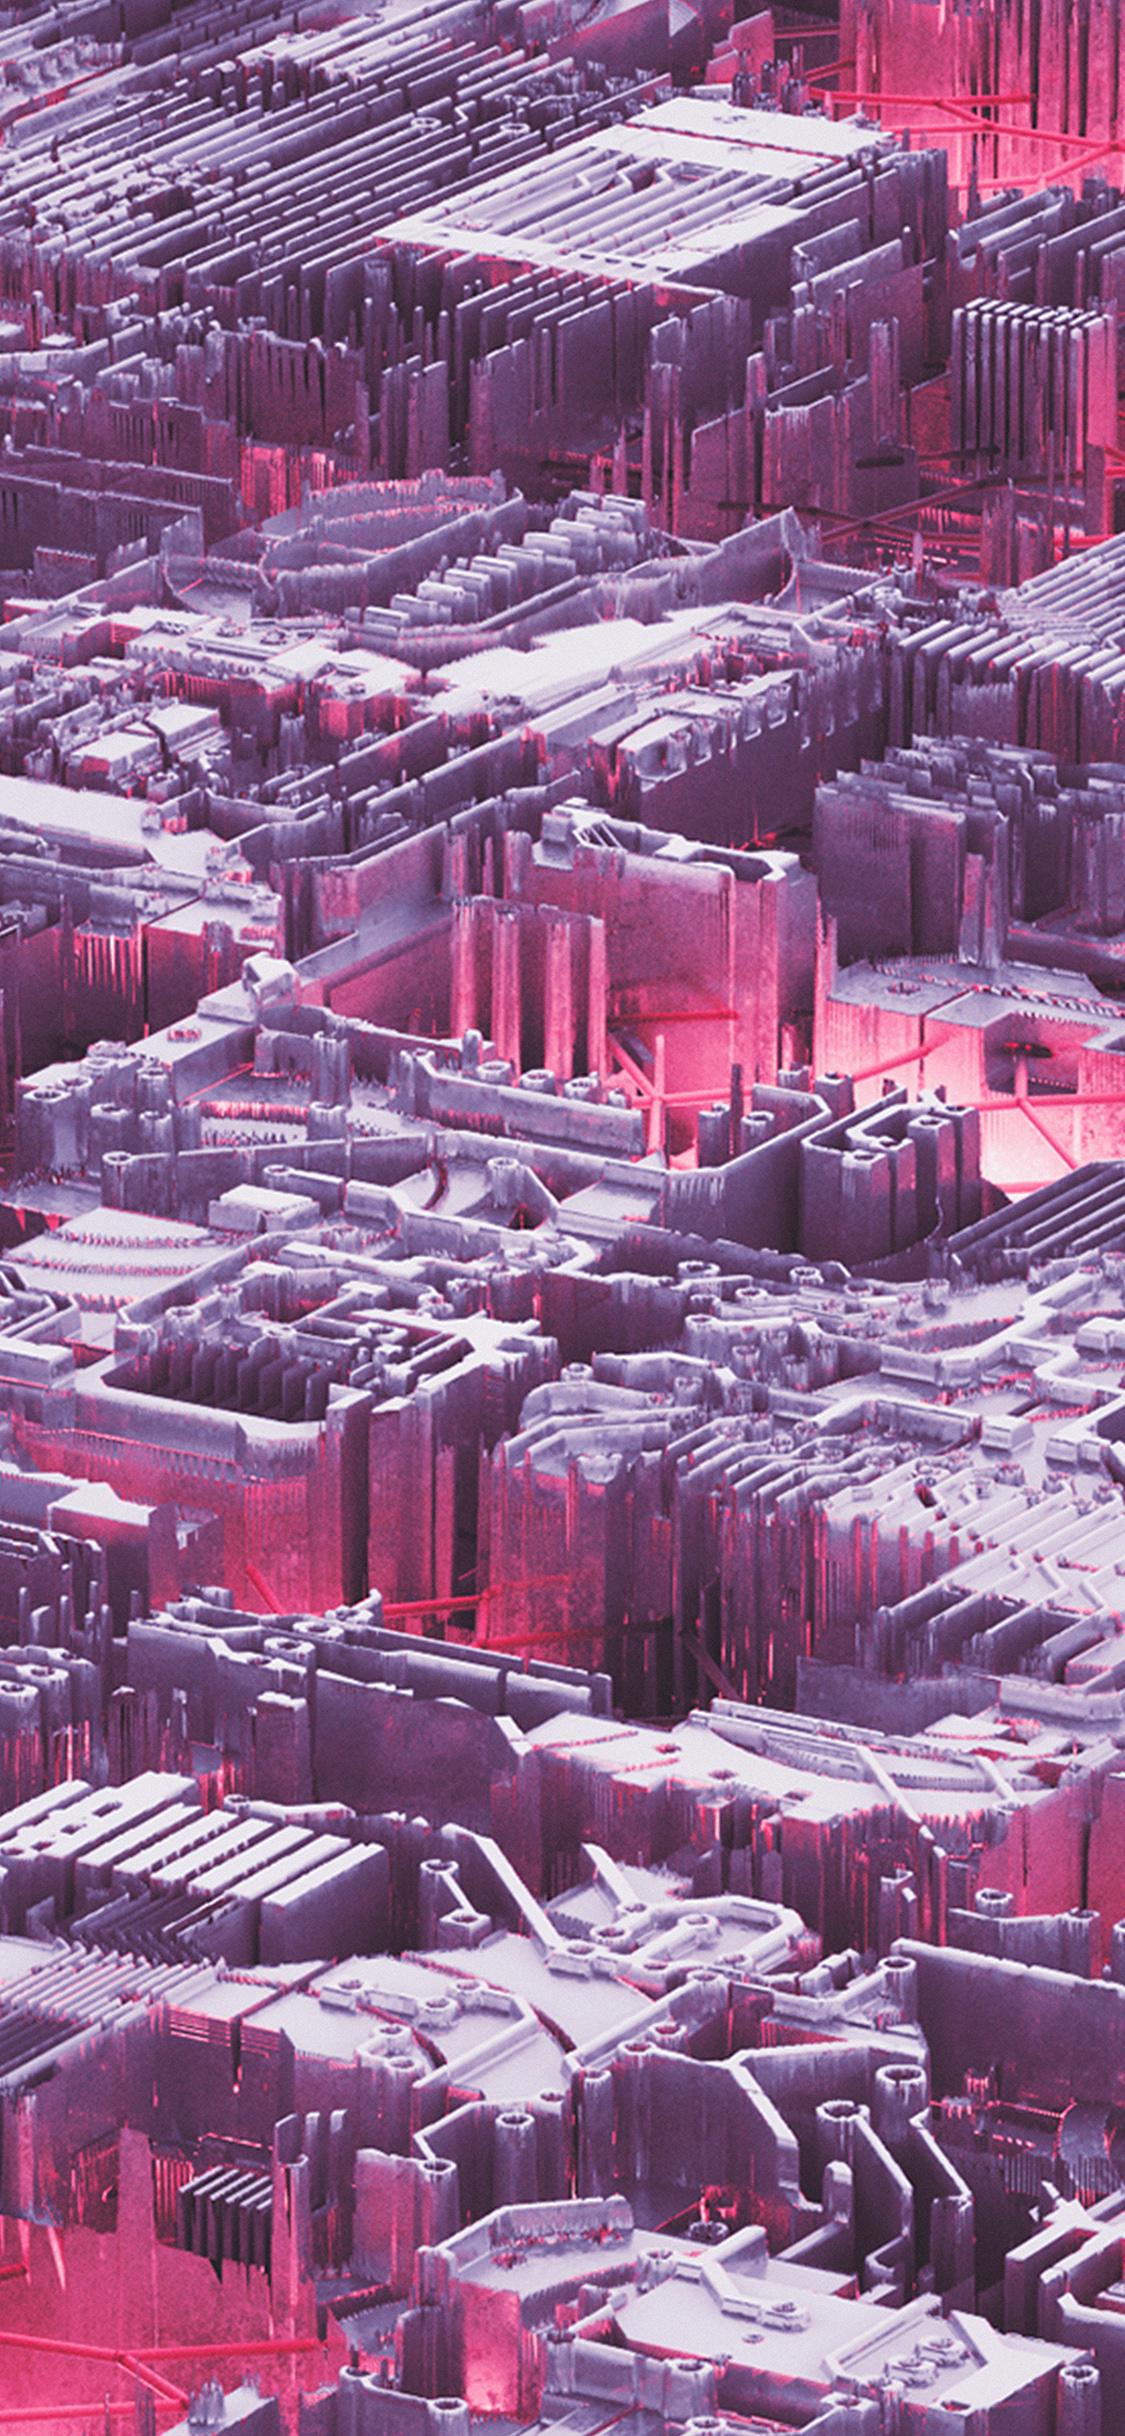 iPhoneXpapers.com-Apple-iPhone-wallpaper-vw49-abstact-pink-purple-art-digital-pattern-background